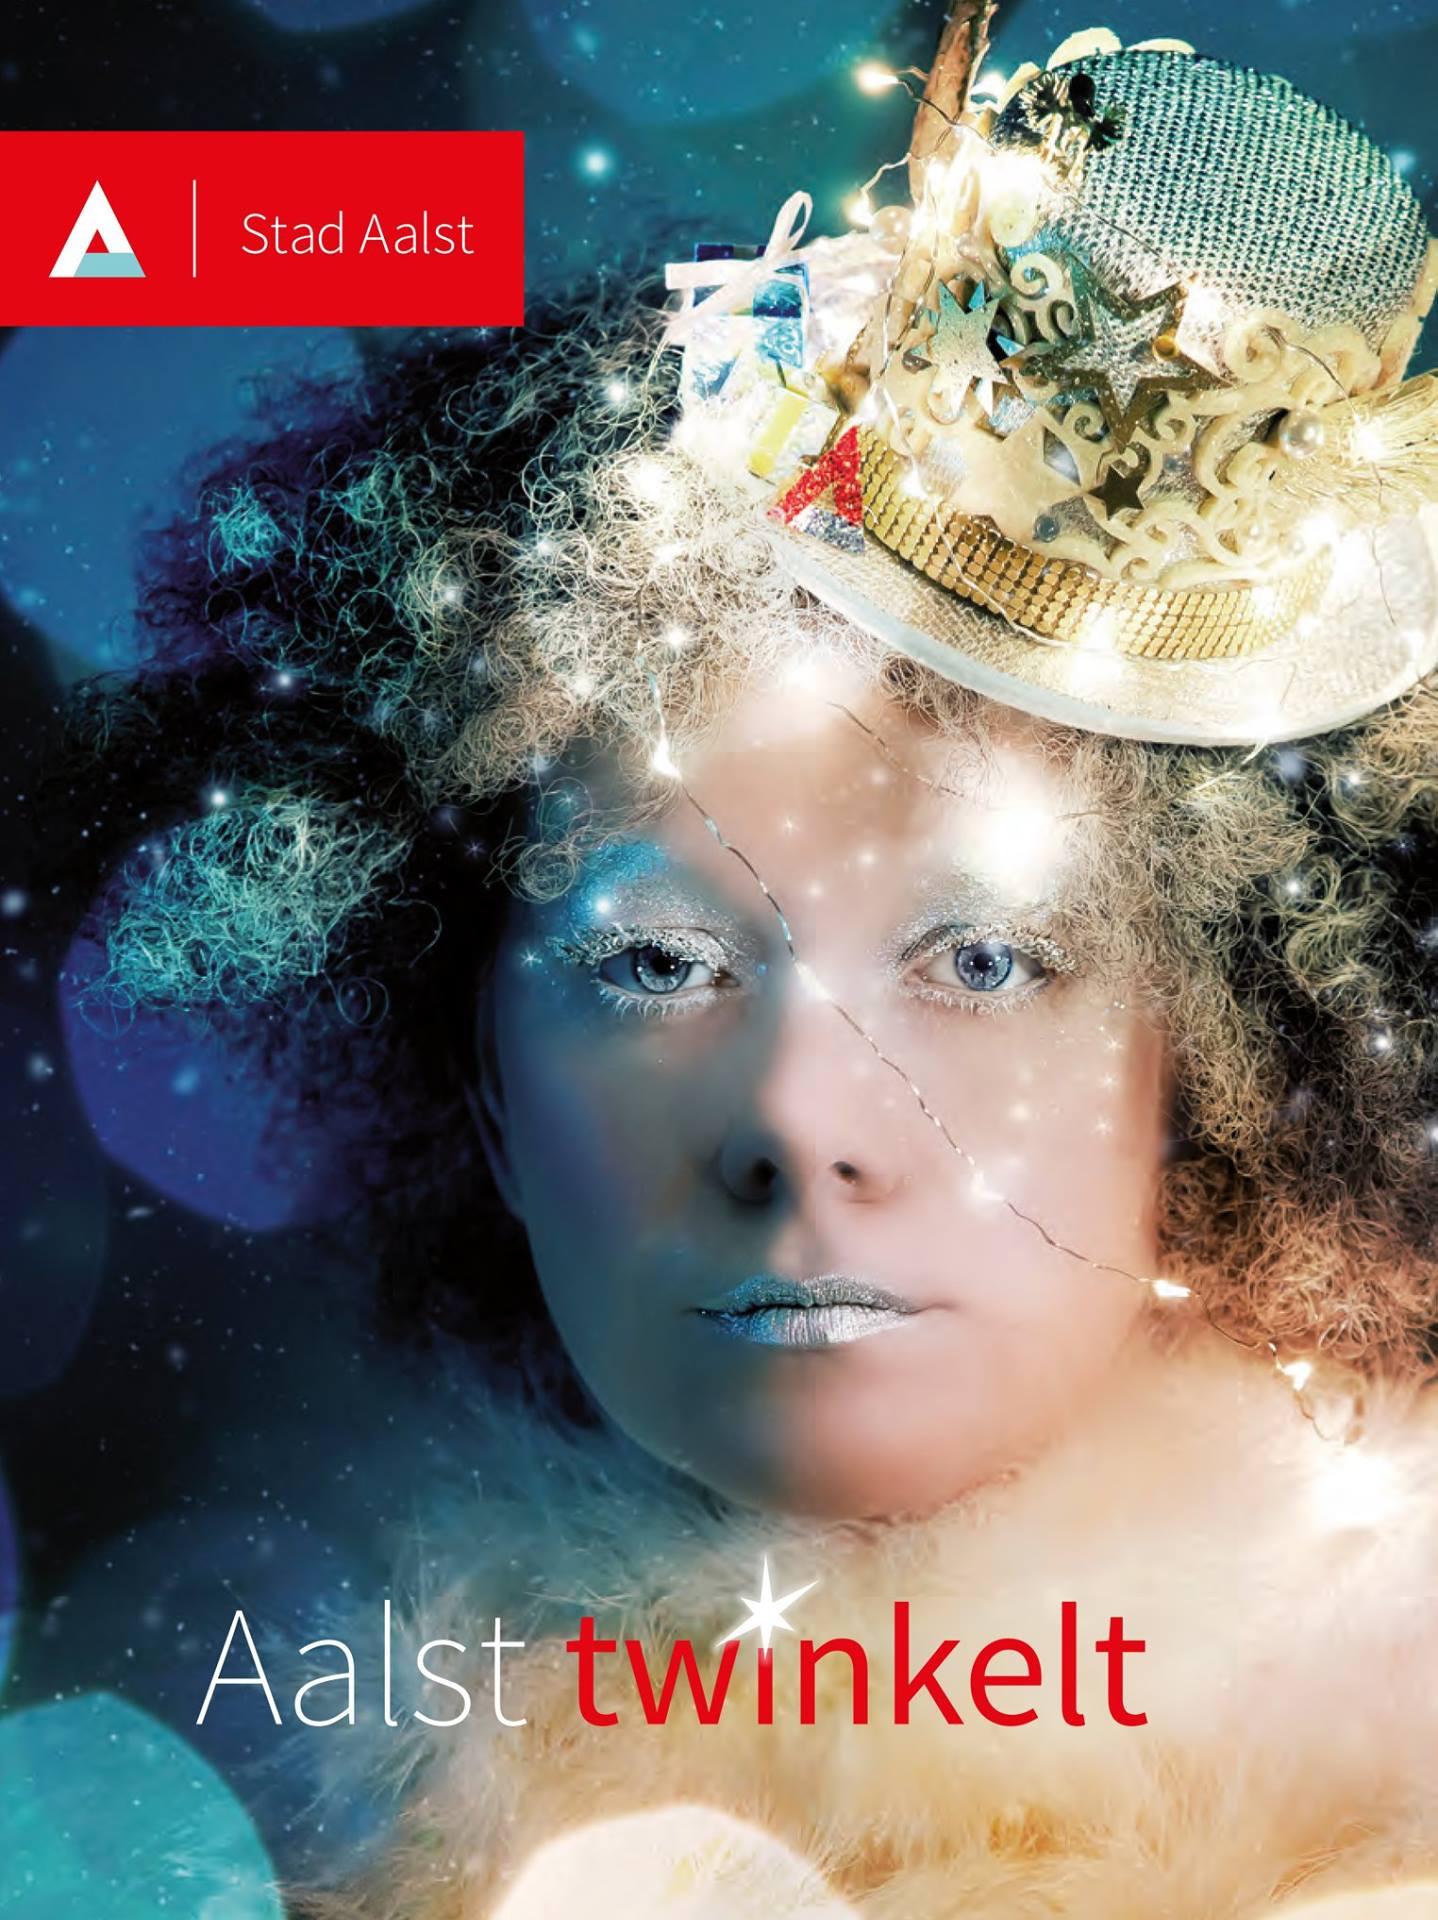 Campagnebeeld Aalst